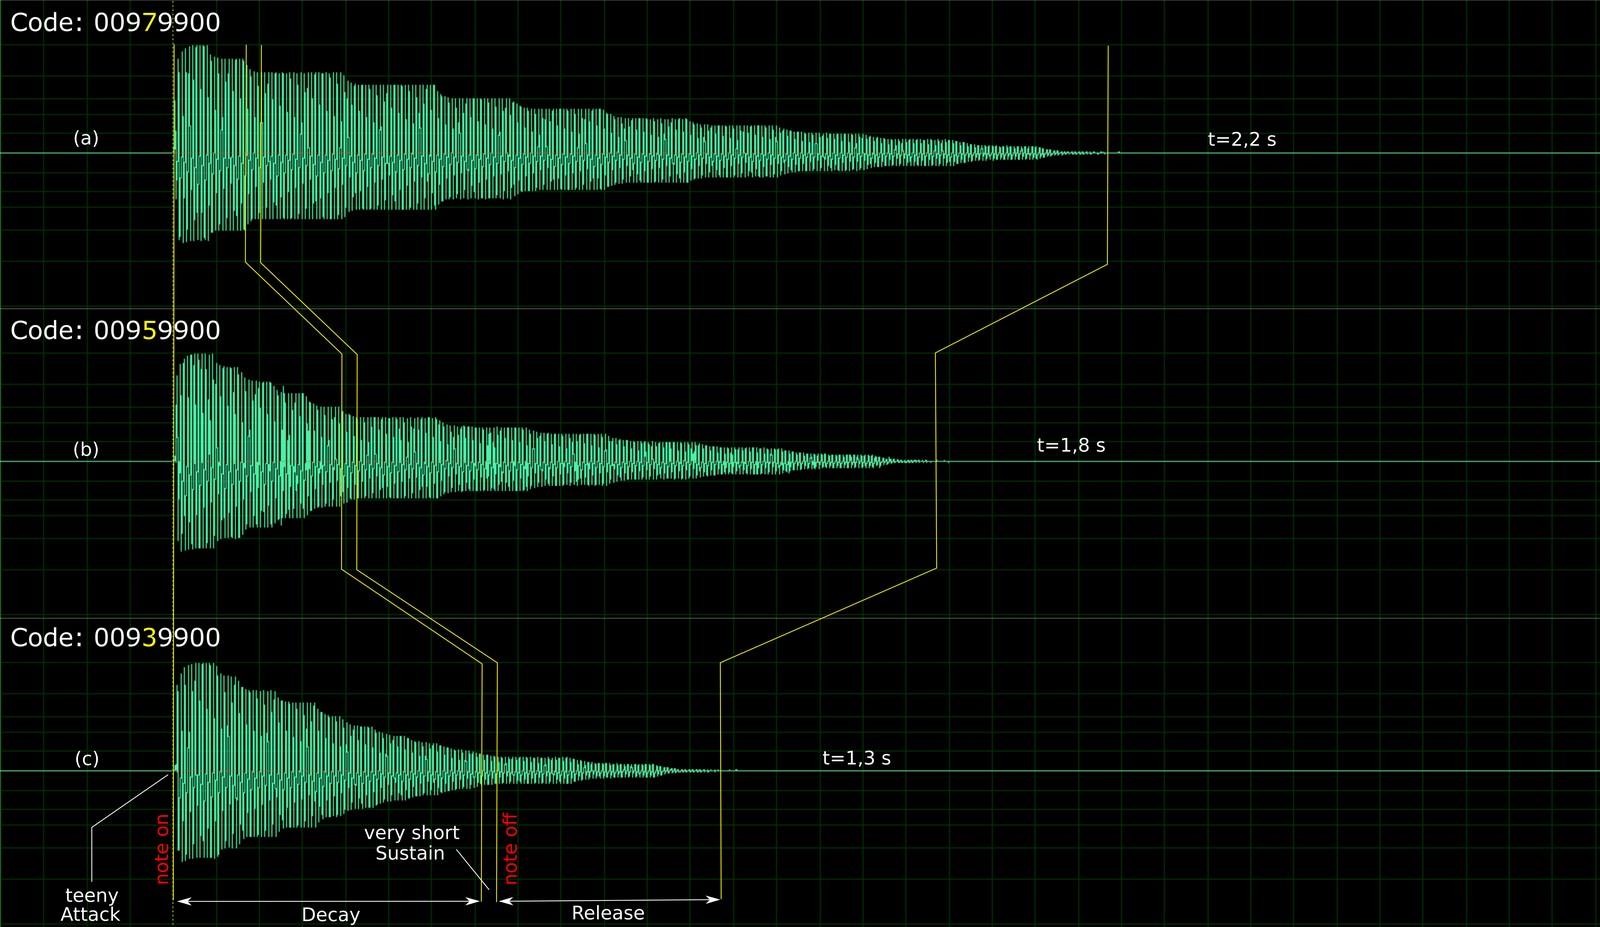 Casio VL-1 decay vs release settings waveforms